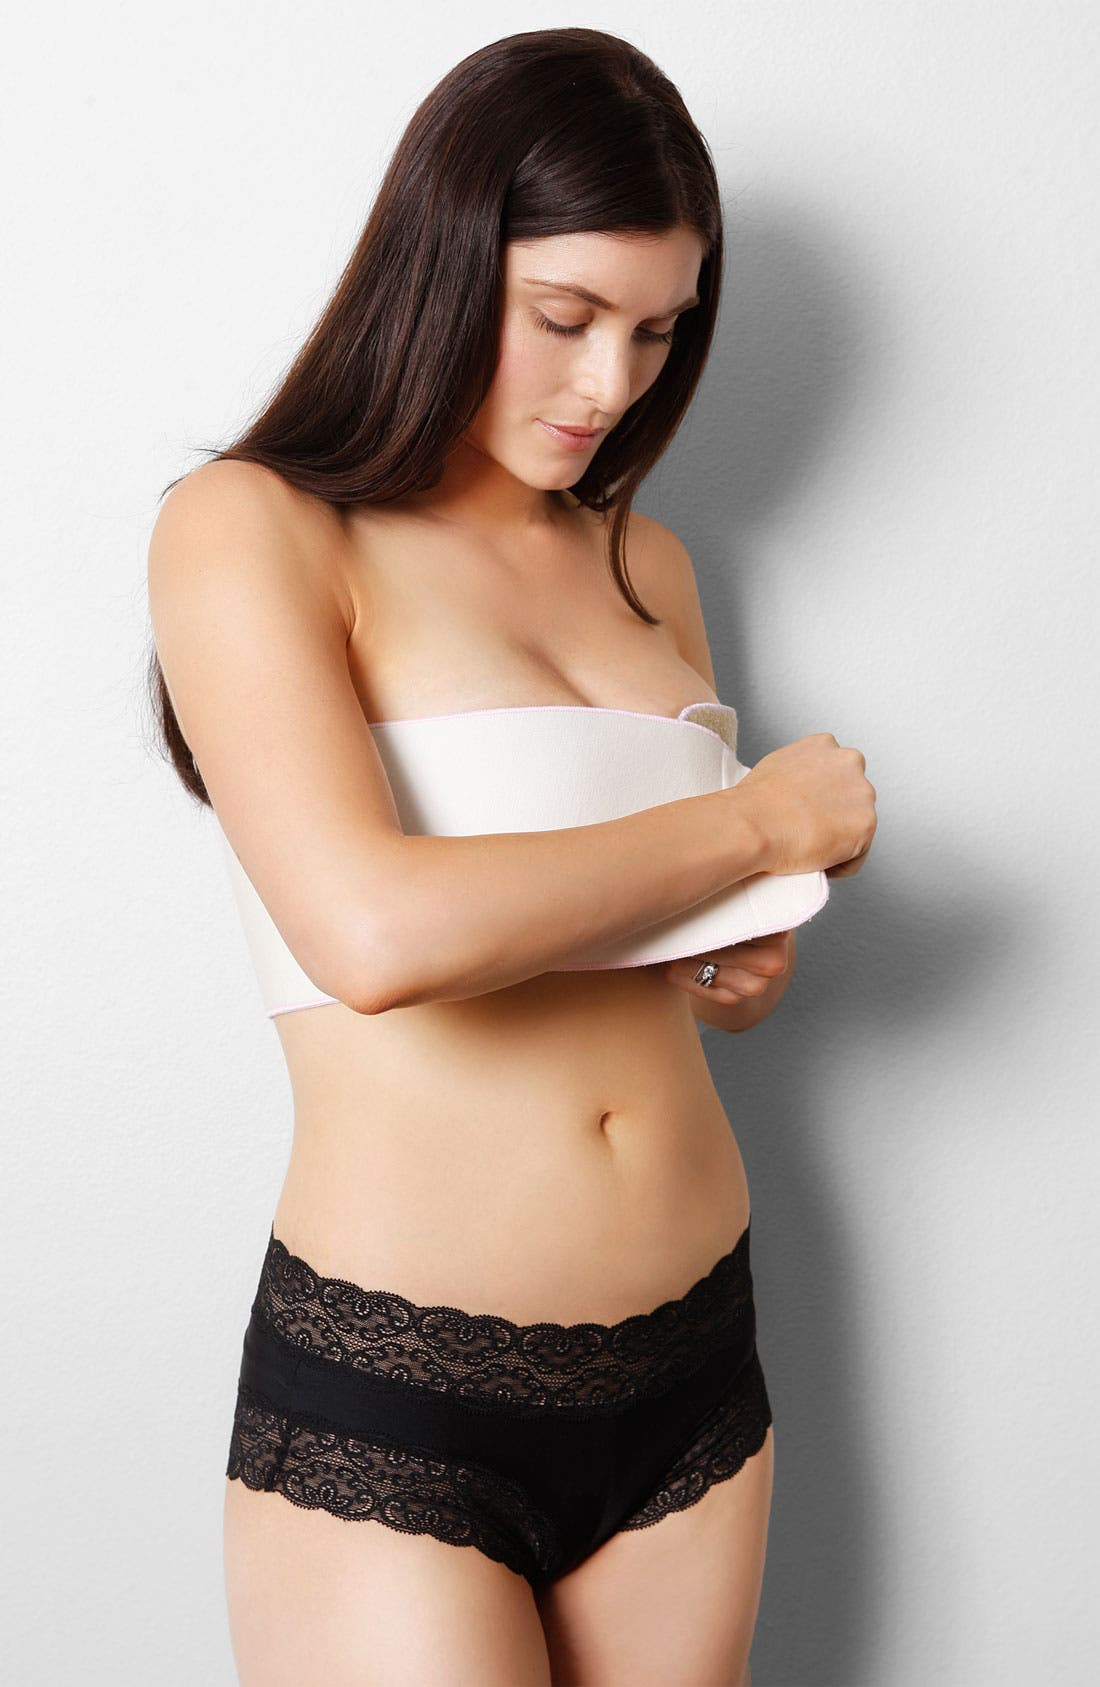 Alternate Image 1 Selected - Belly Bandit® 'Bosom Bandit' Breast Support Wrap